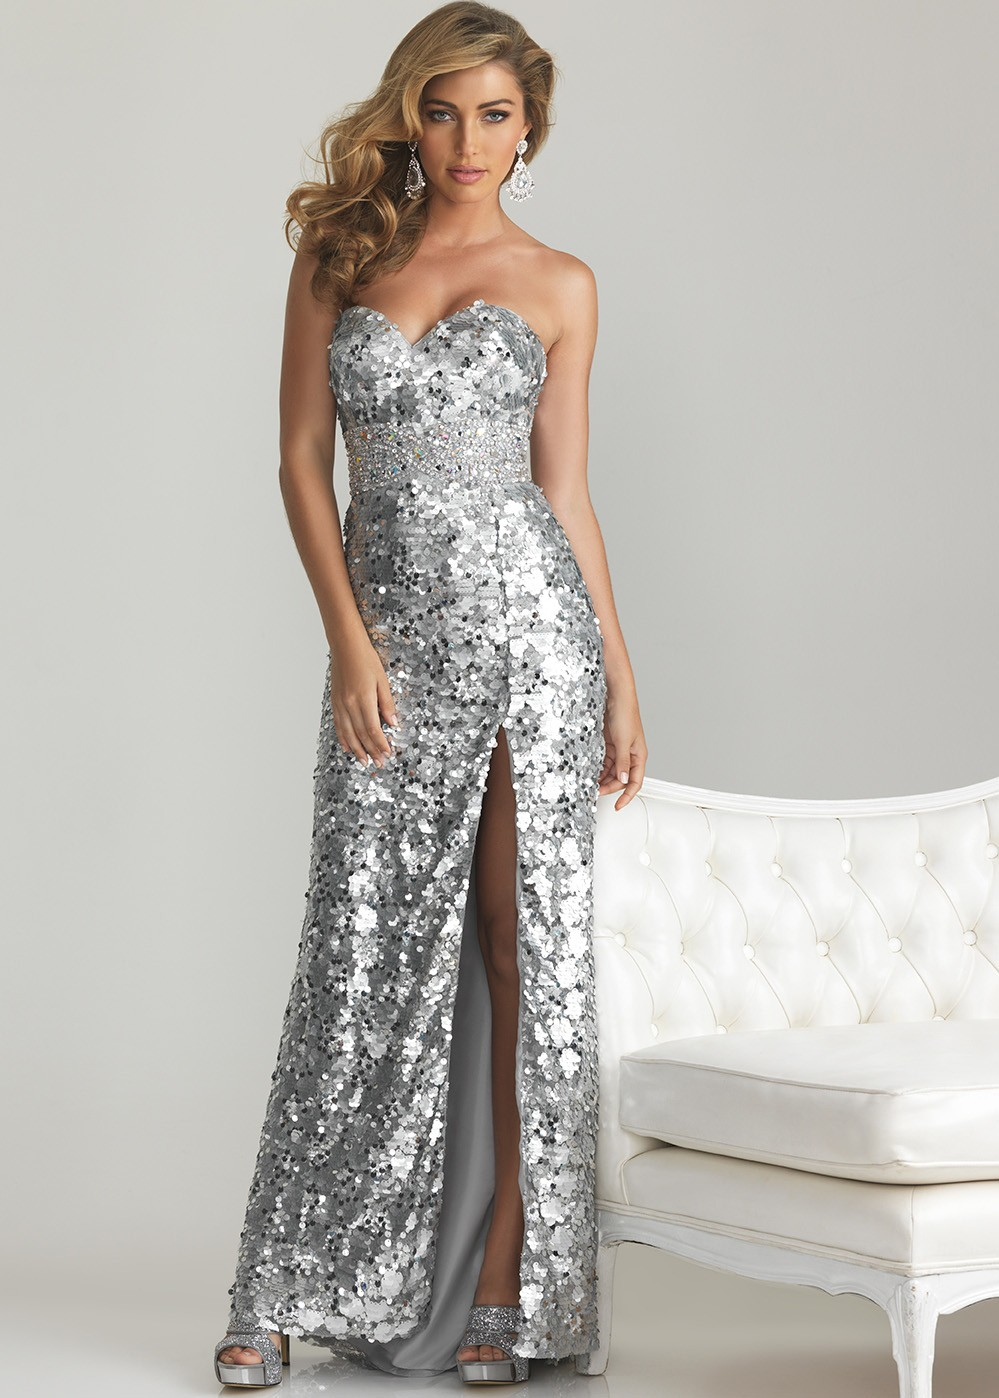 The Silver Sequin Dress - prom dress fashion | Dress Wallpaper